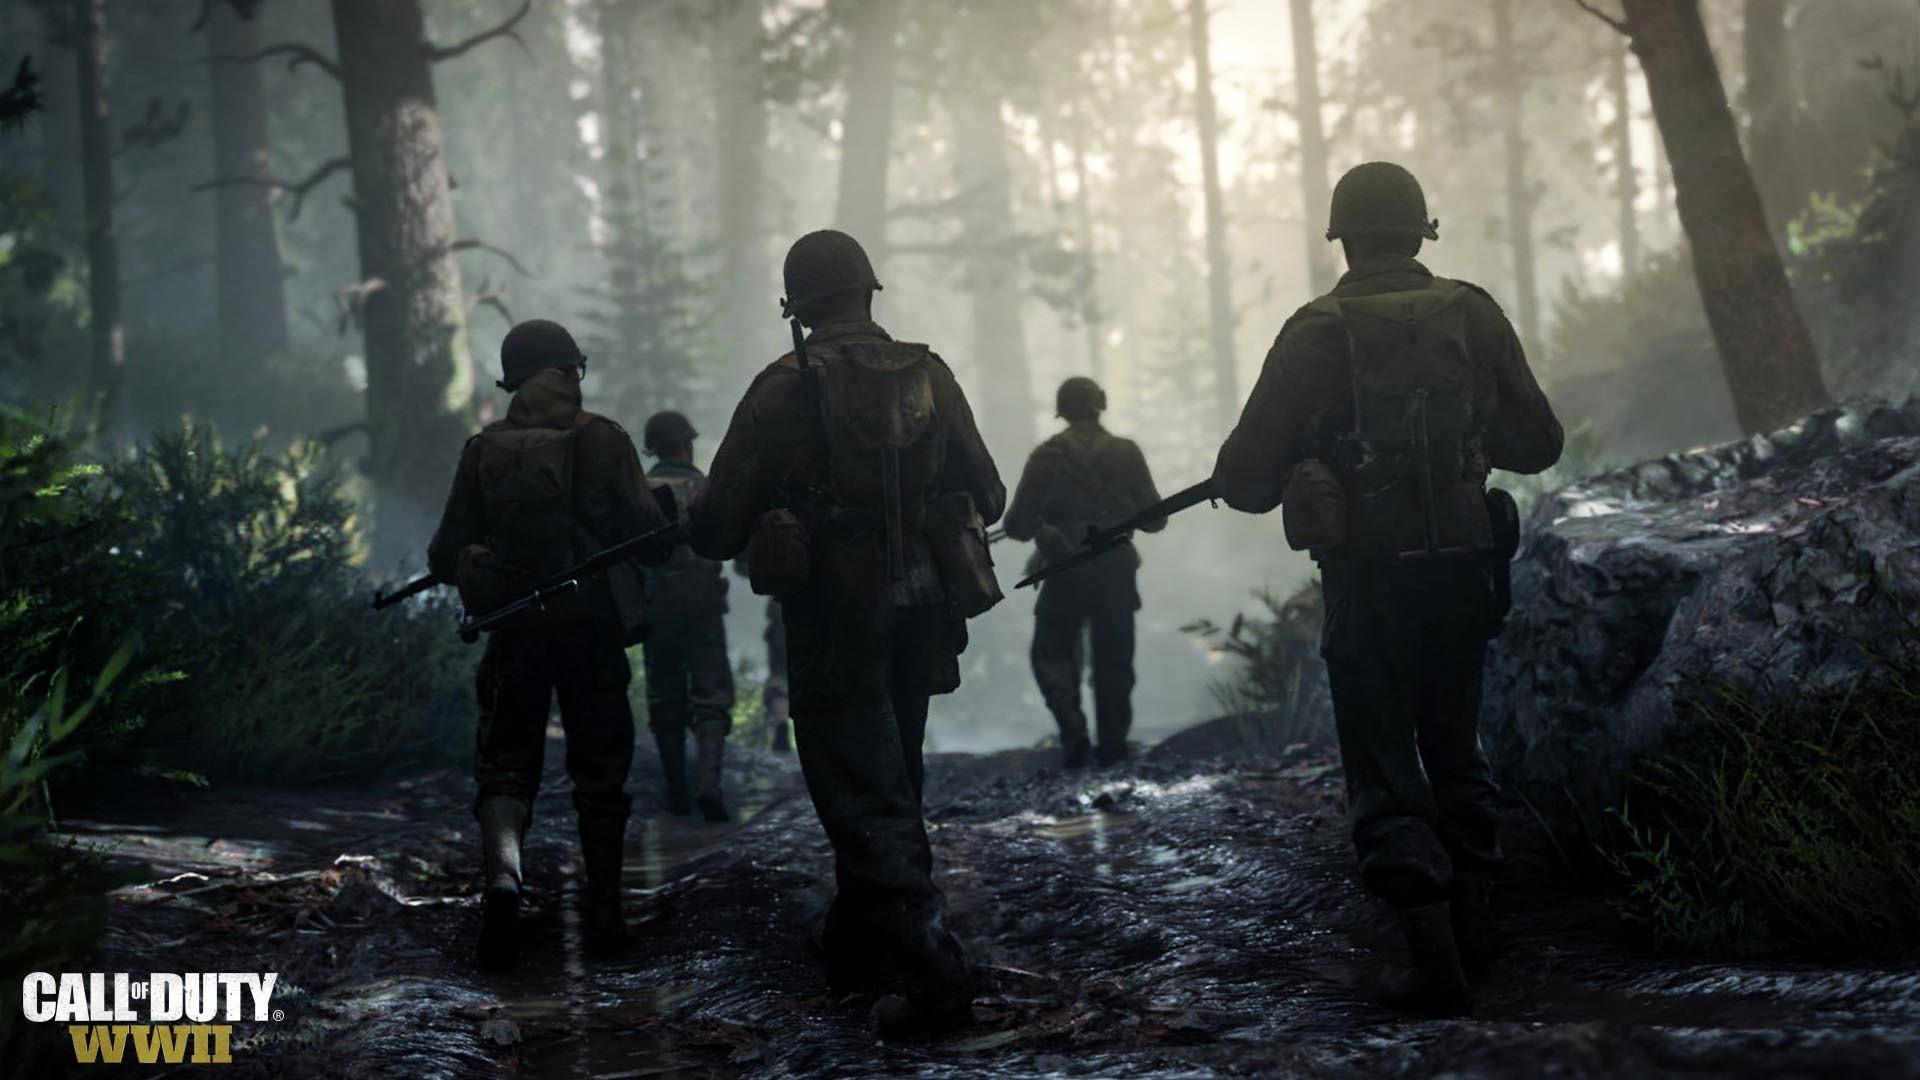 Call of Duty: WWII HD wallpaper